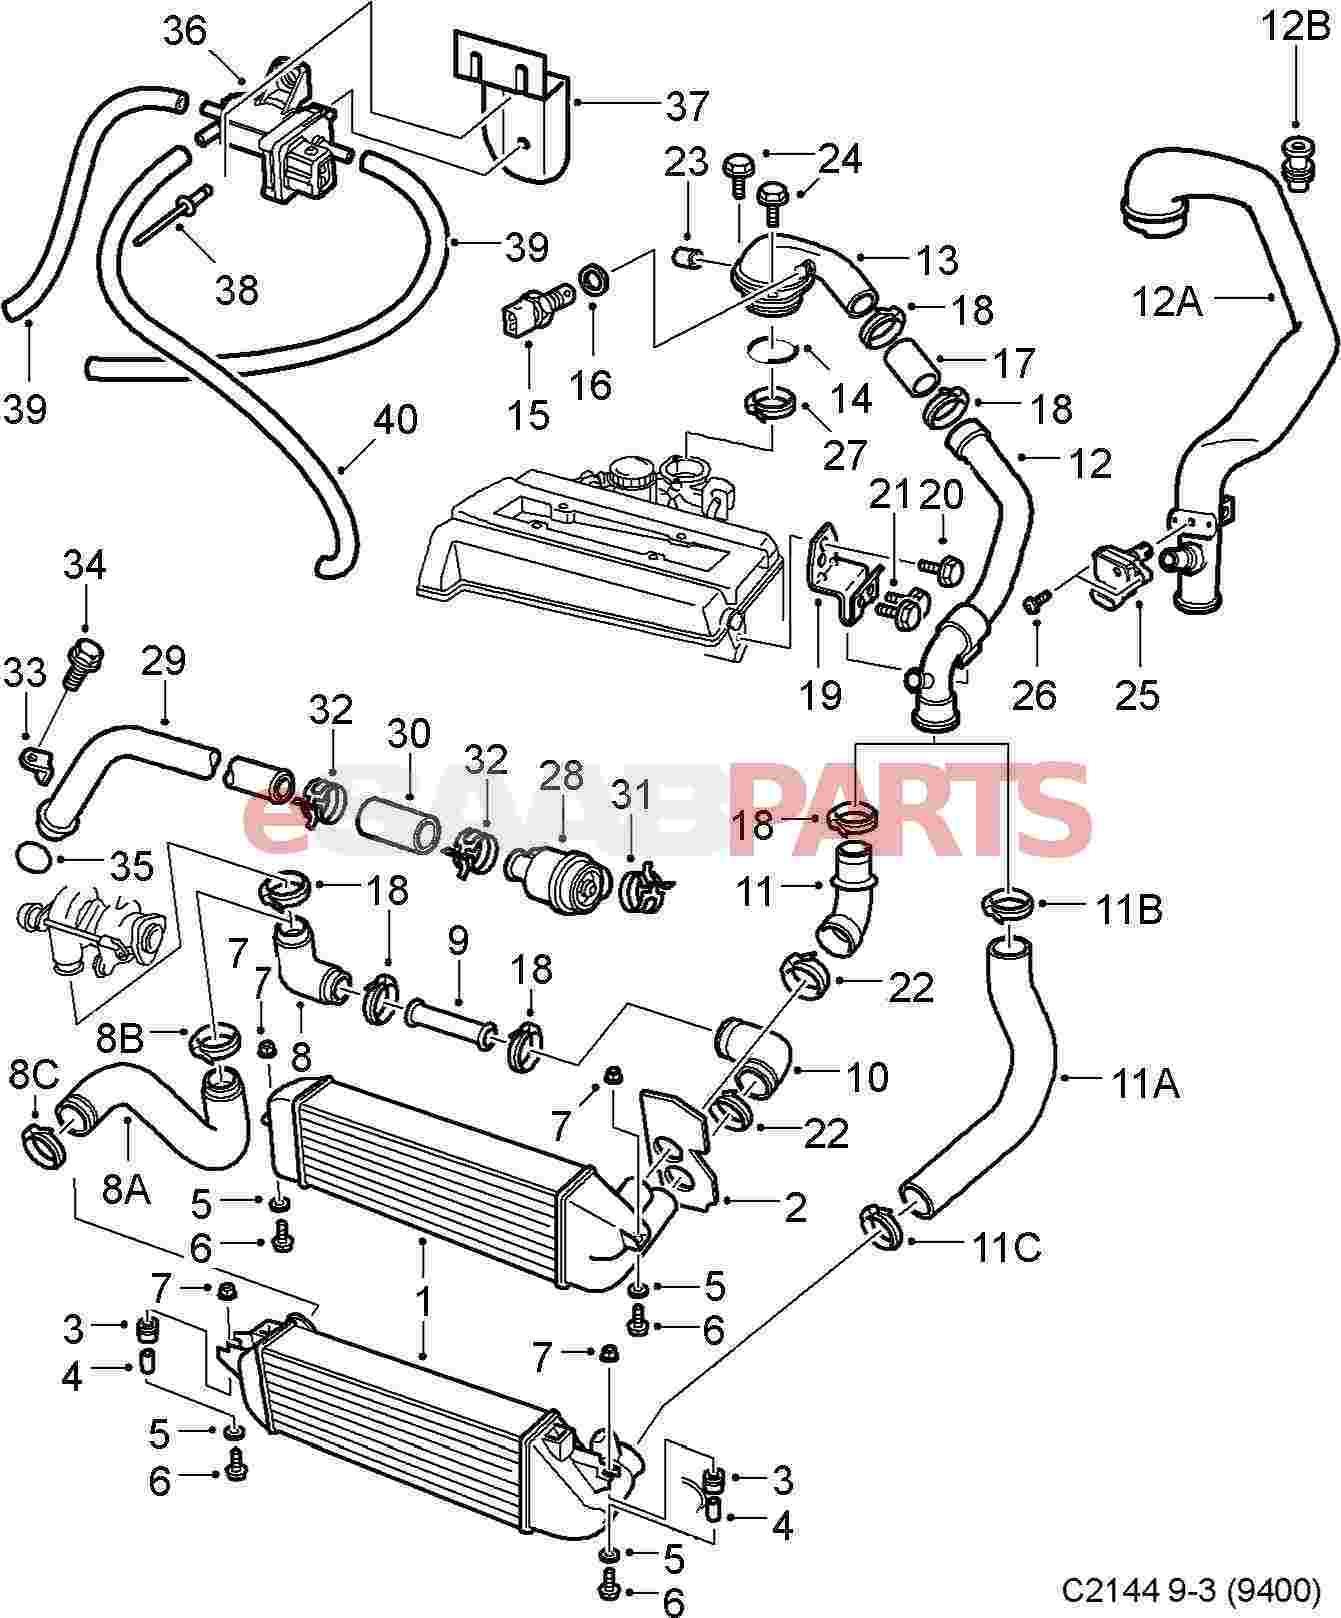 1999 Ford Windstar Transmission Diagrams 99 Wiring Diagram